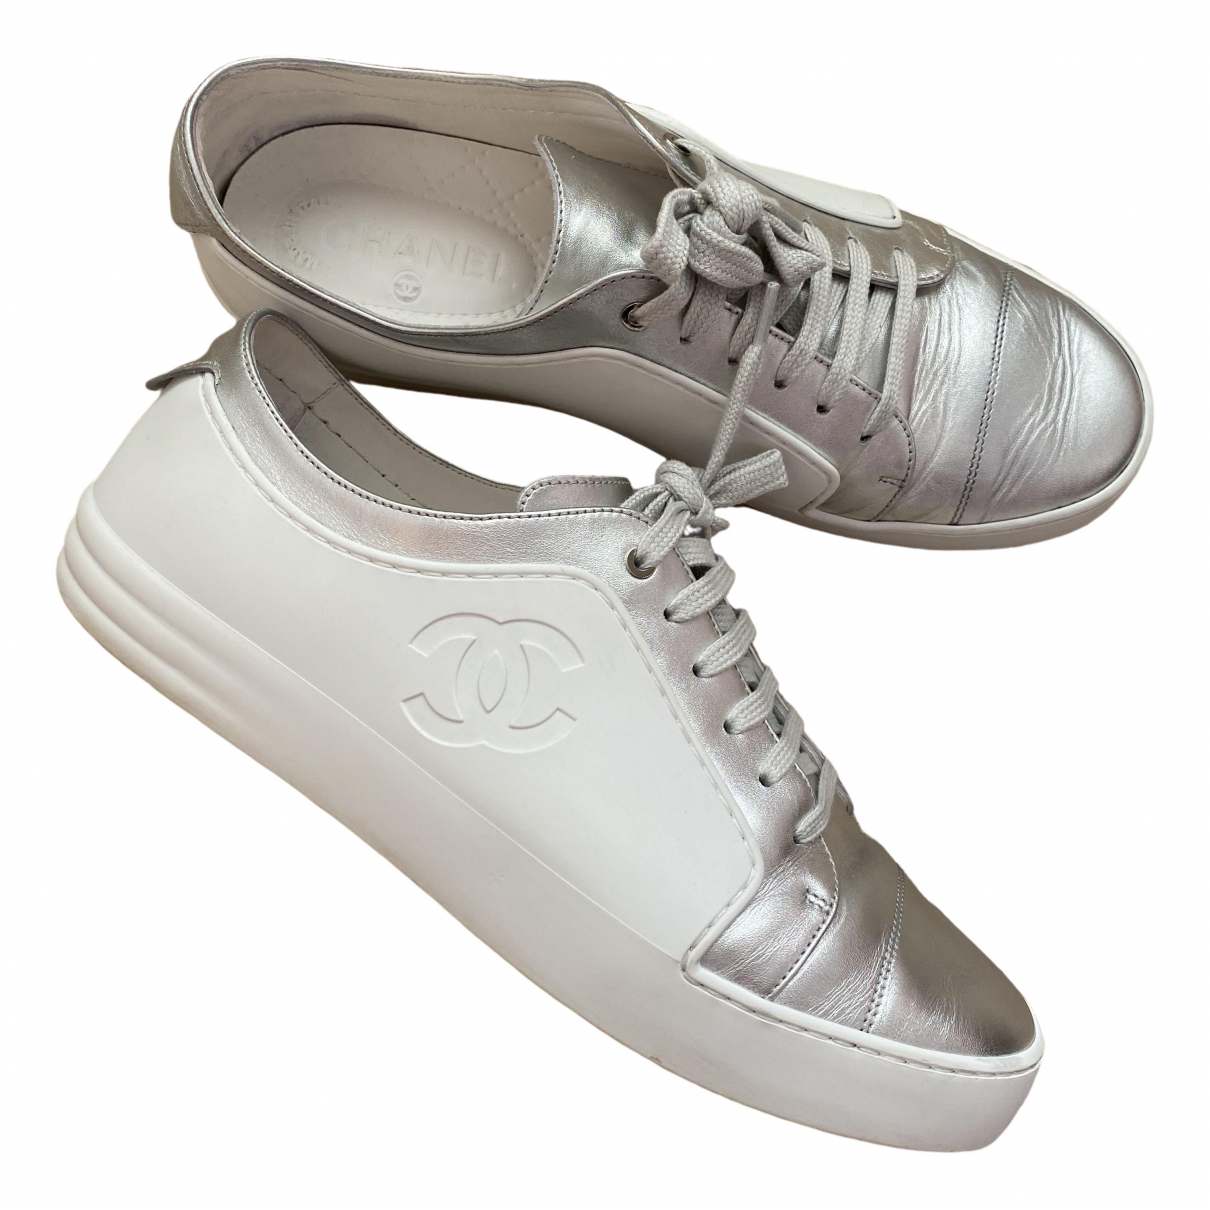 Chanel \N Sneakers in  Weiss Leder